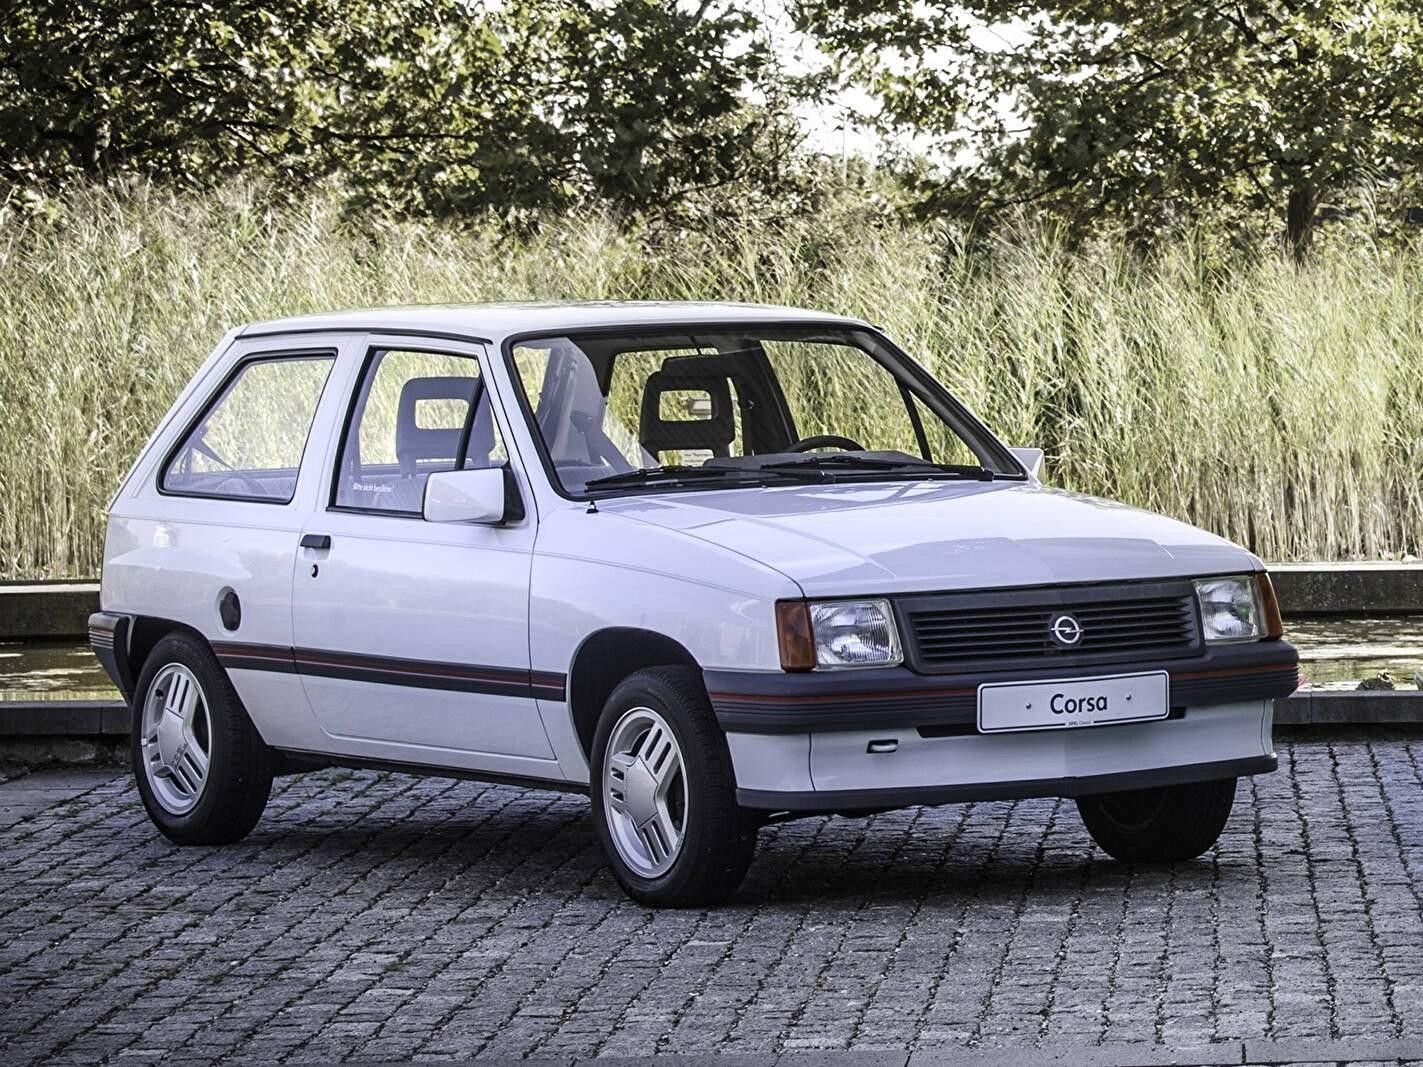 Opel Corsa 1.5 TD (1988-1993),  ajouté par fox58